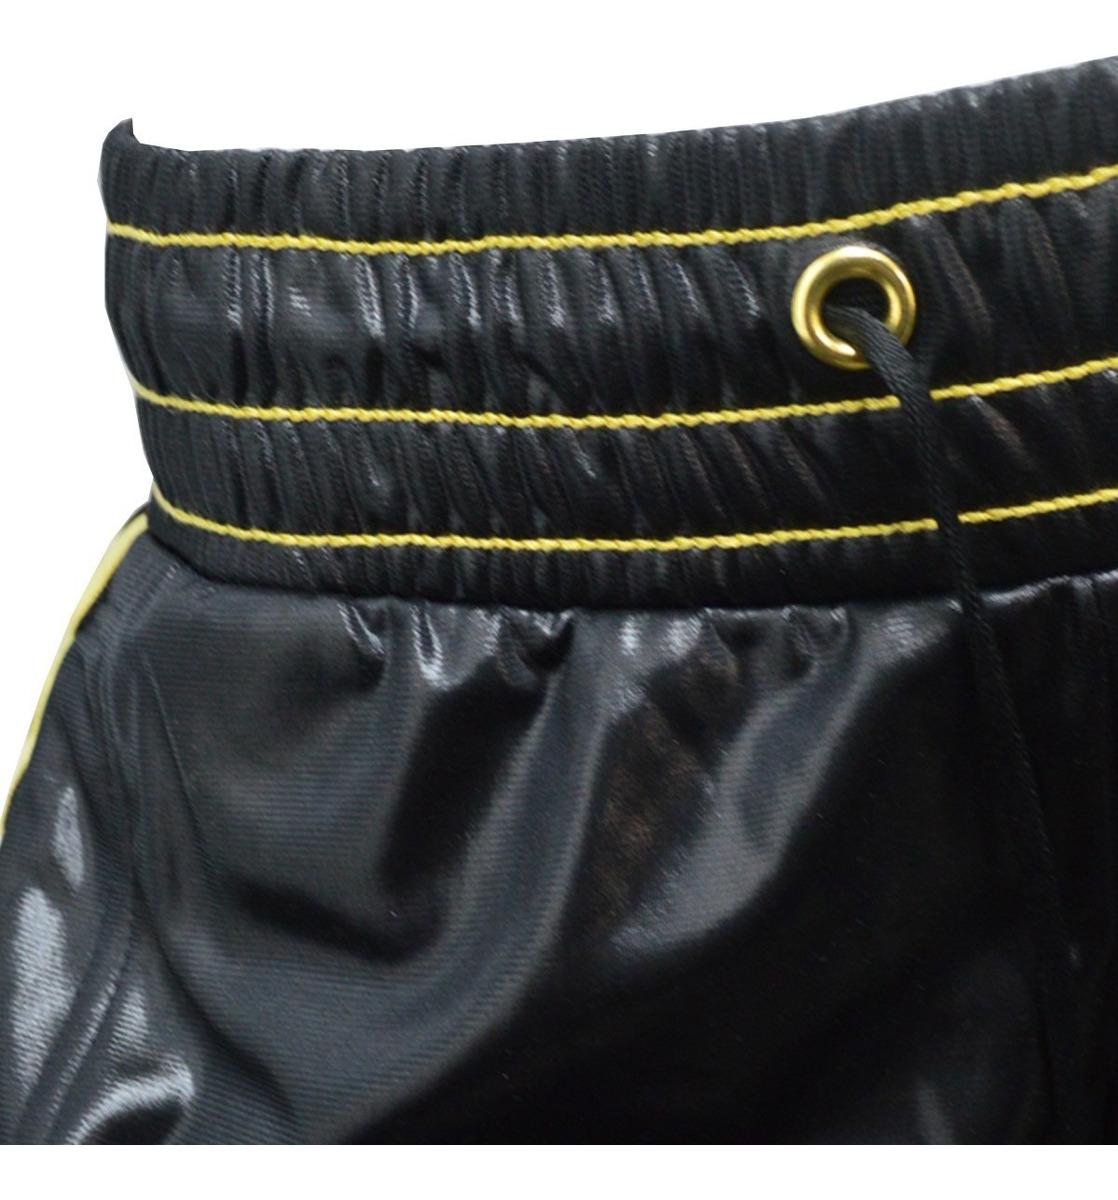 Pants adidas Mujer Negro Dorado Bl Logo Tpnt P56753